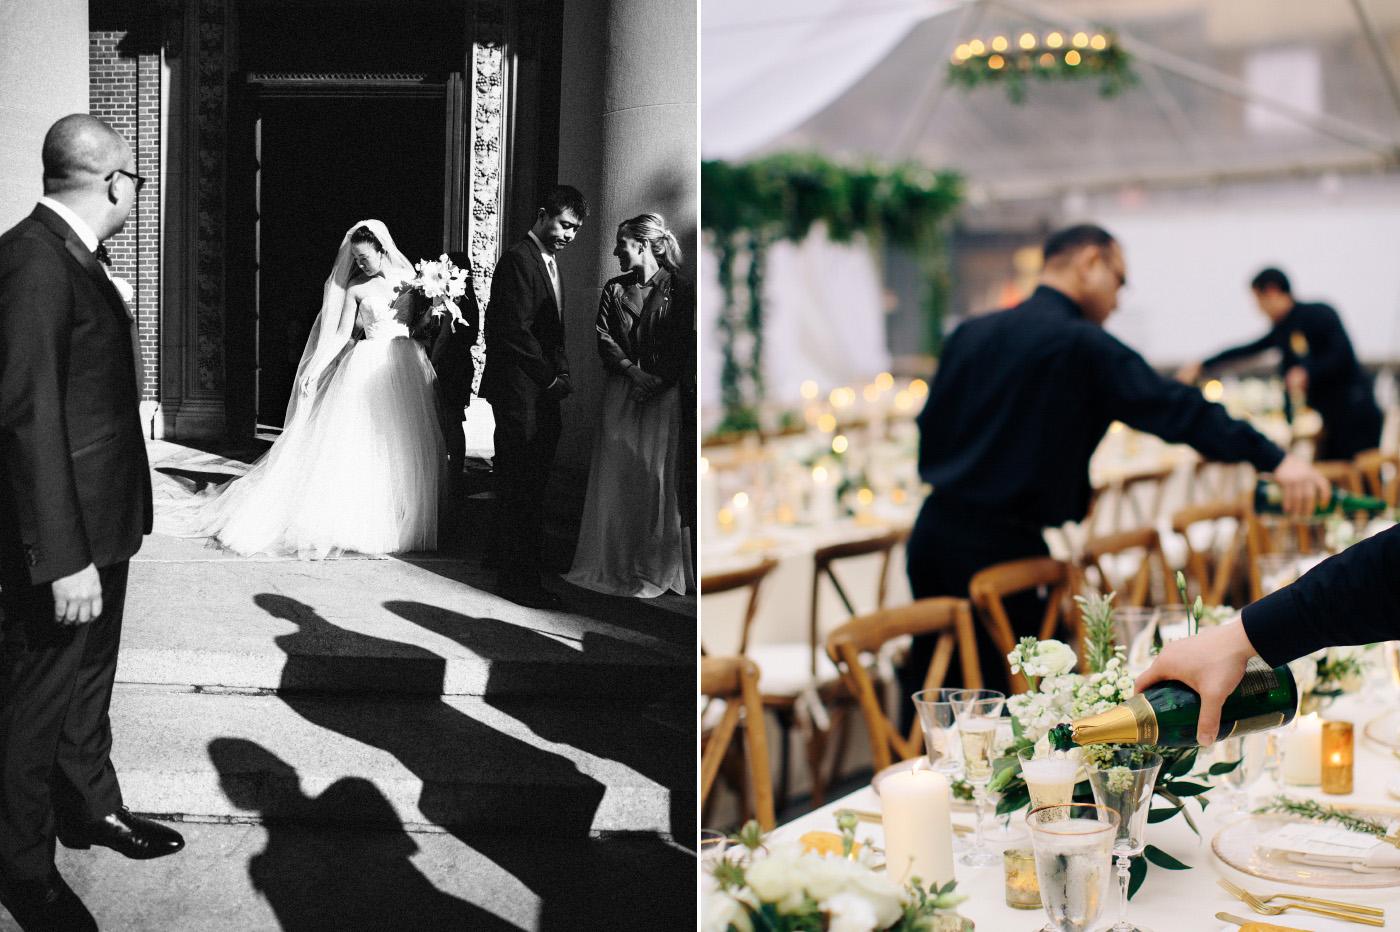 nj_wedding_photography_04.jpg